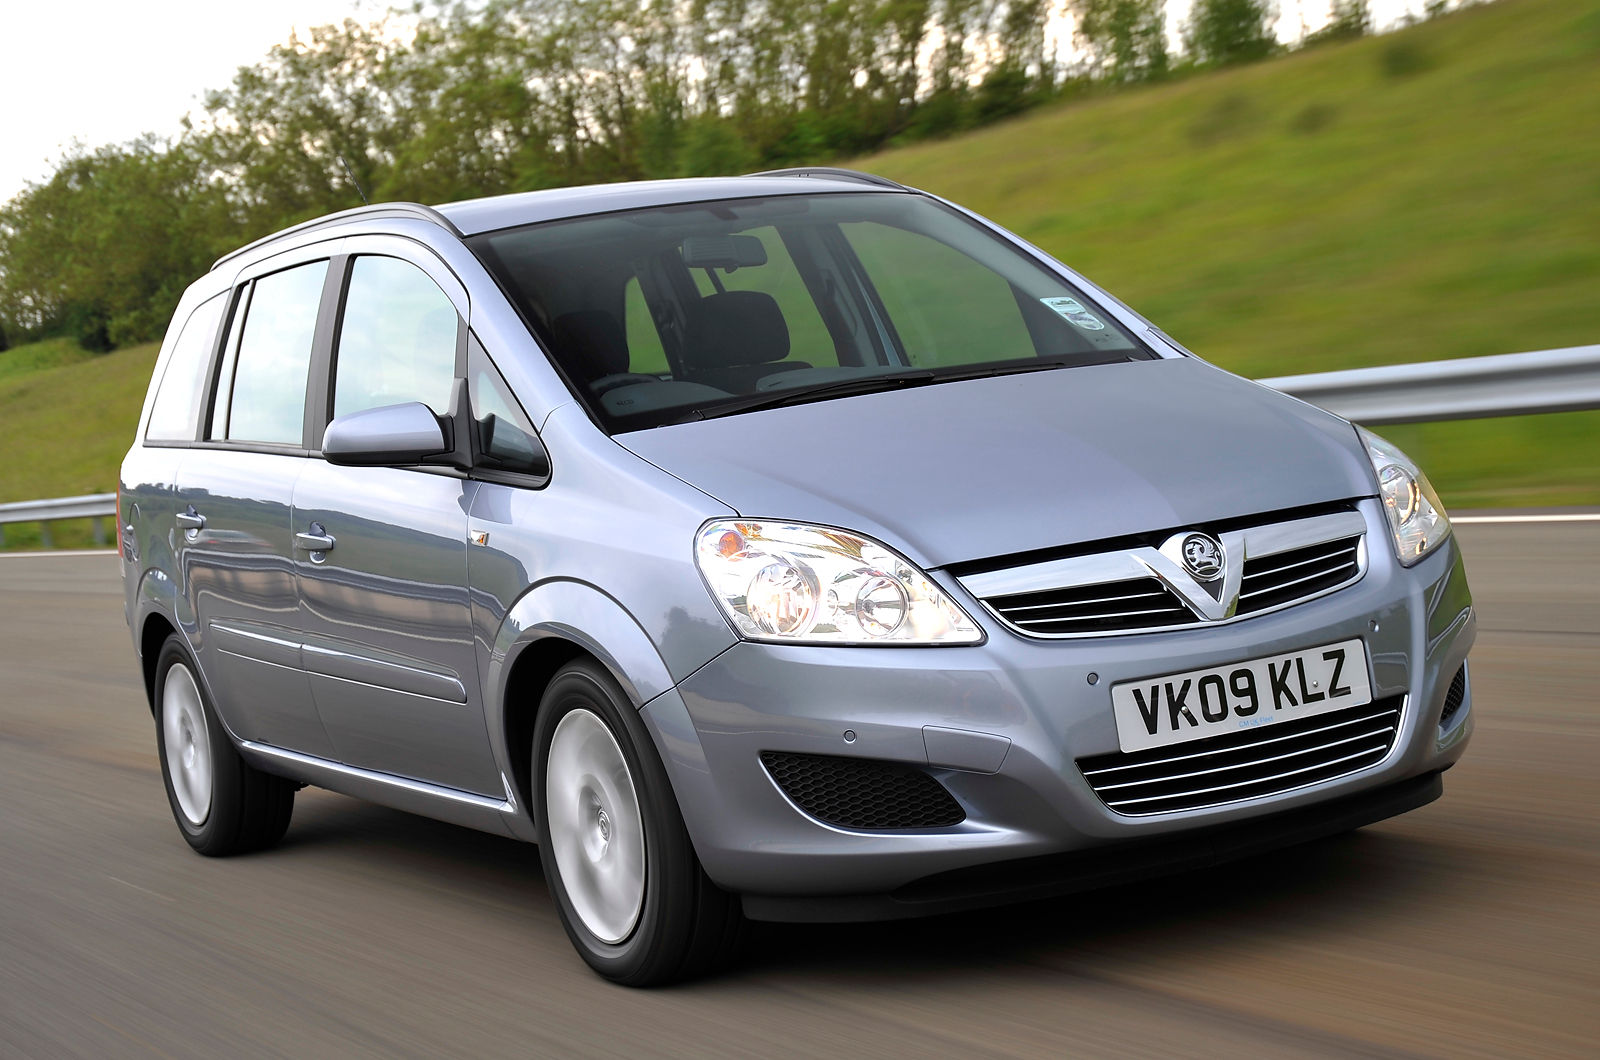 Review of Opel Zafira